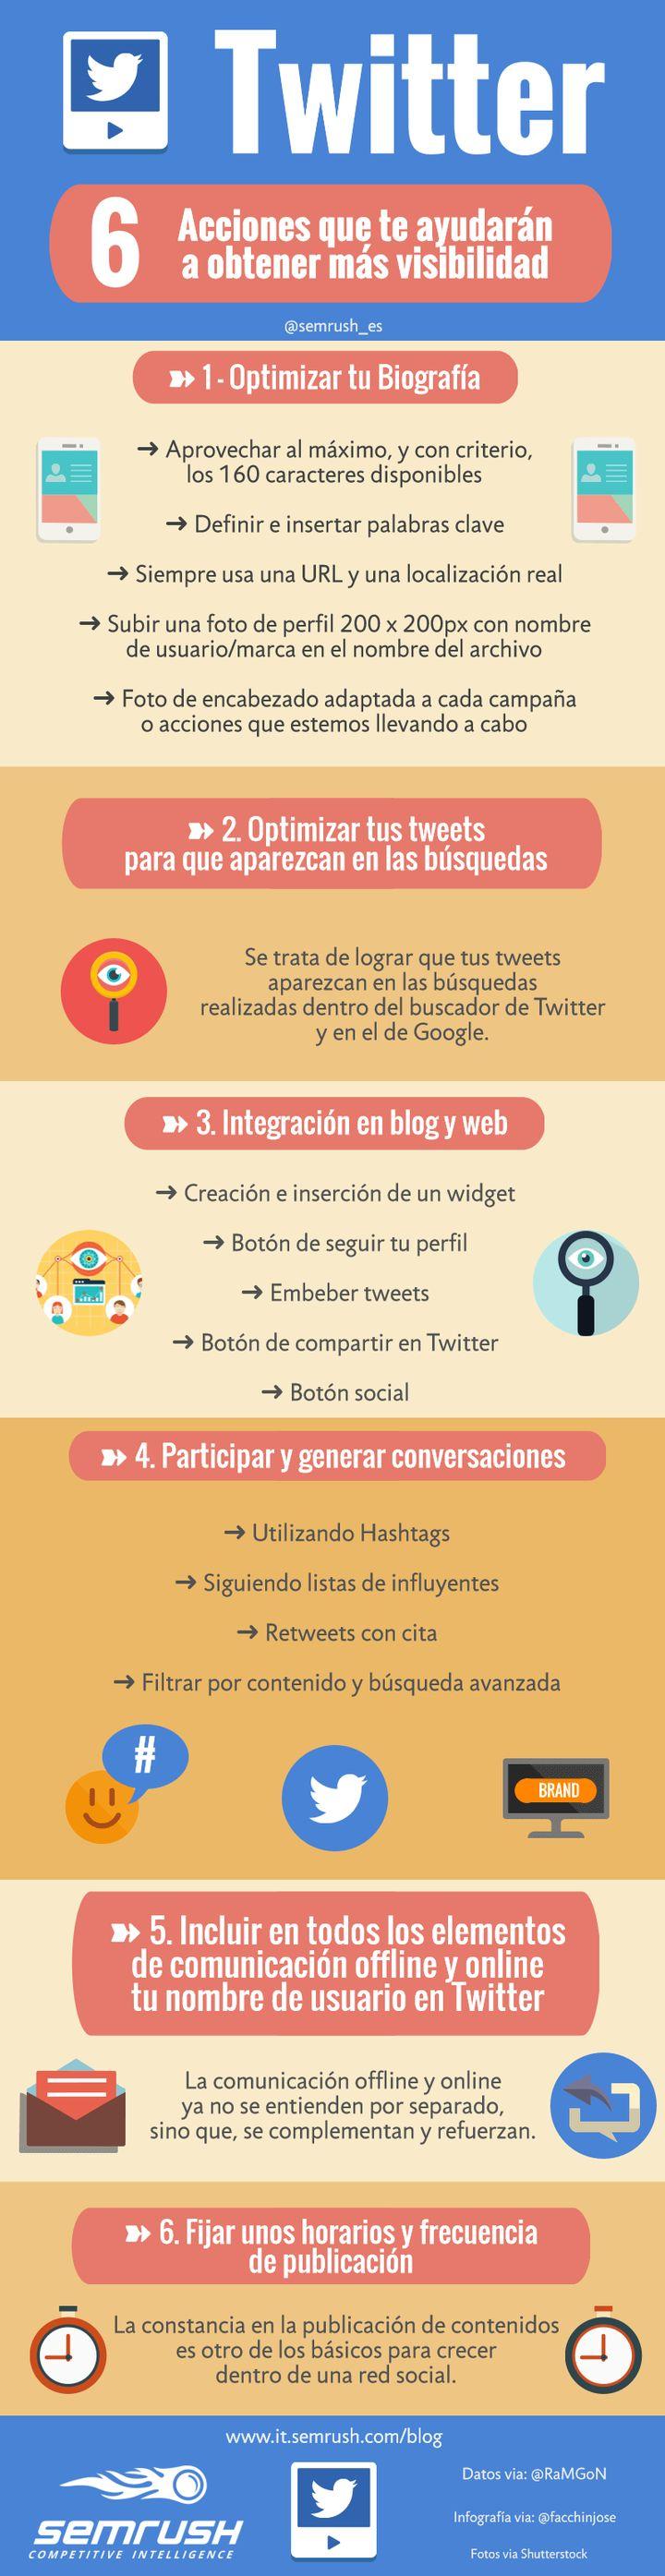 acciones_visibilidad_twitter